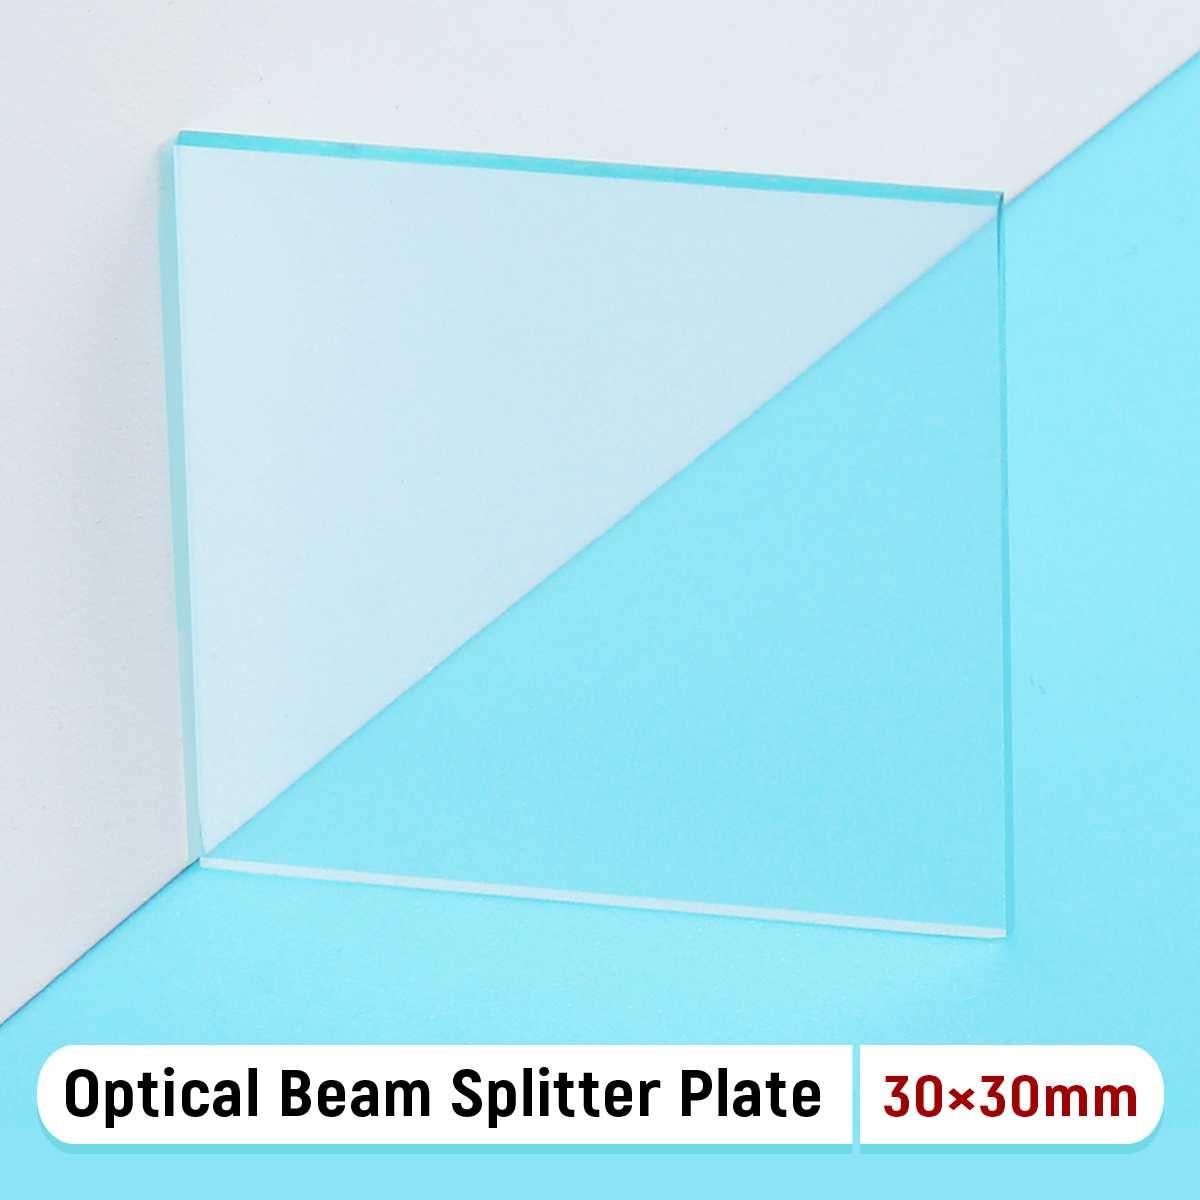 1 Uds., 30x30x1,1mm, 50 R/50 T, placa divisora de haz óptico, lente óptica de láser para instrumentos de análisis de espectro láser, Etc.